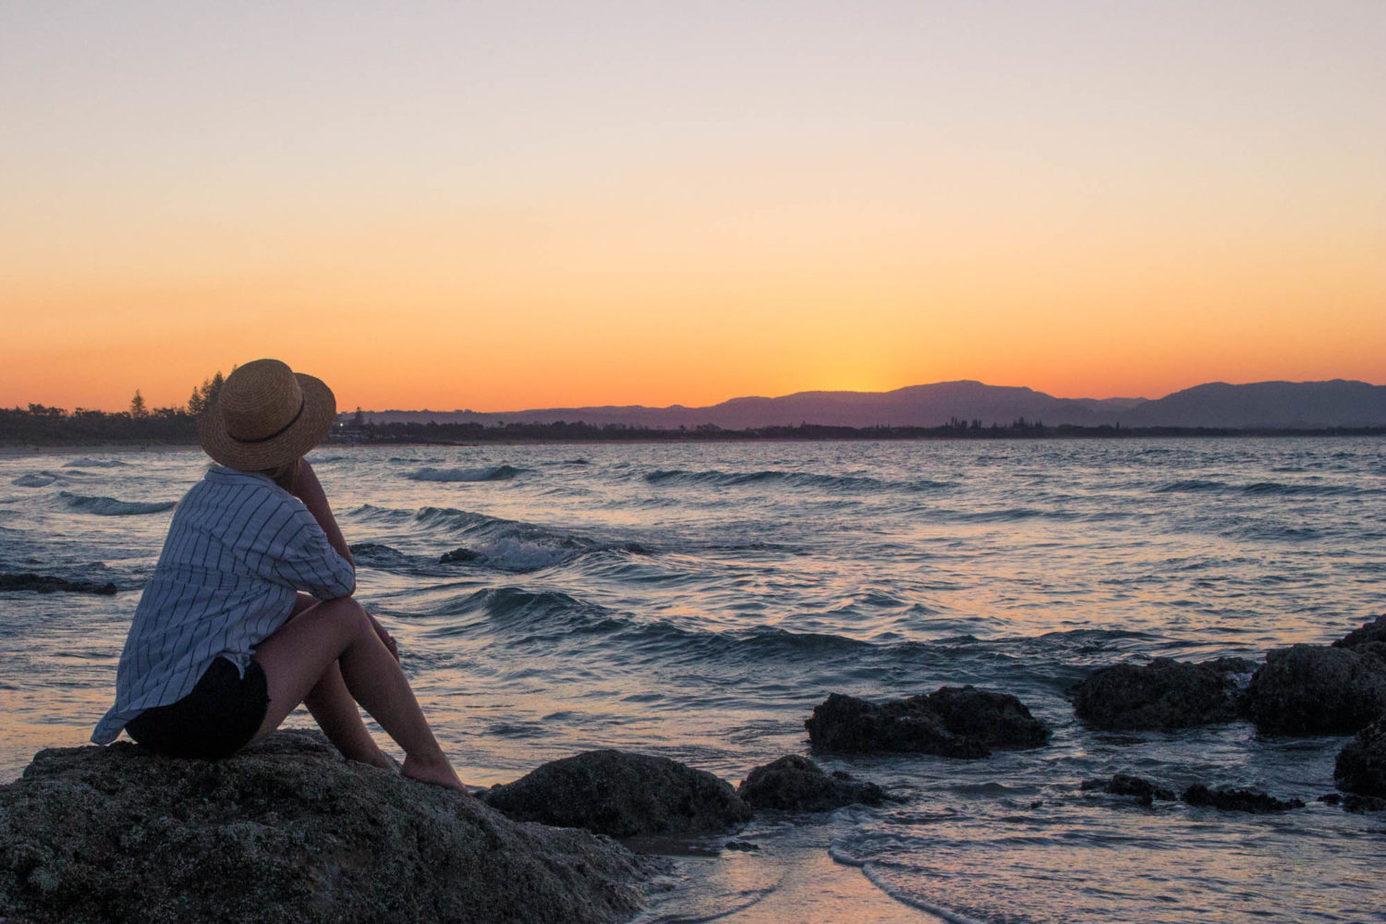 local_spots_byron_bay_sunset_beach_rooftopantics_travelblog